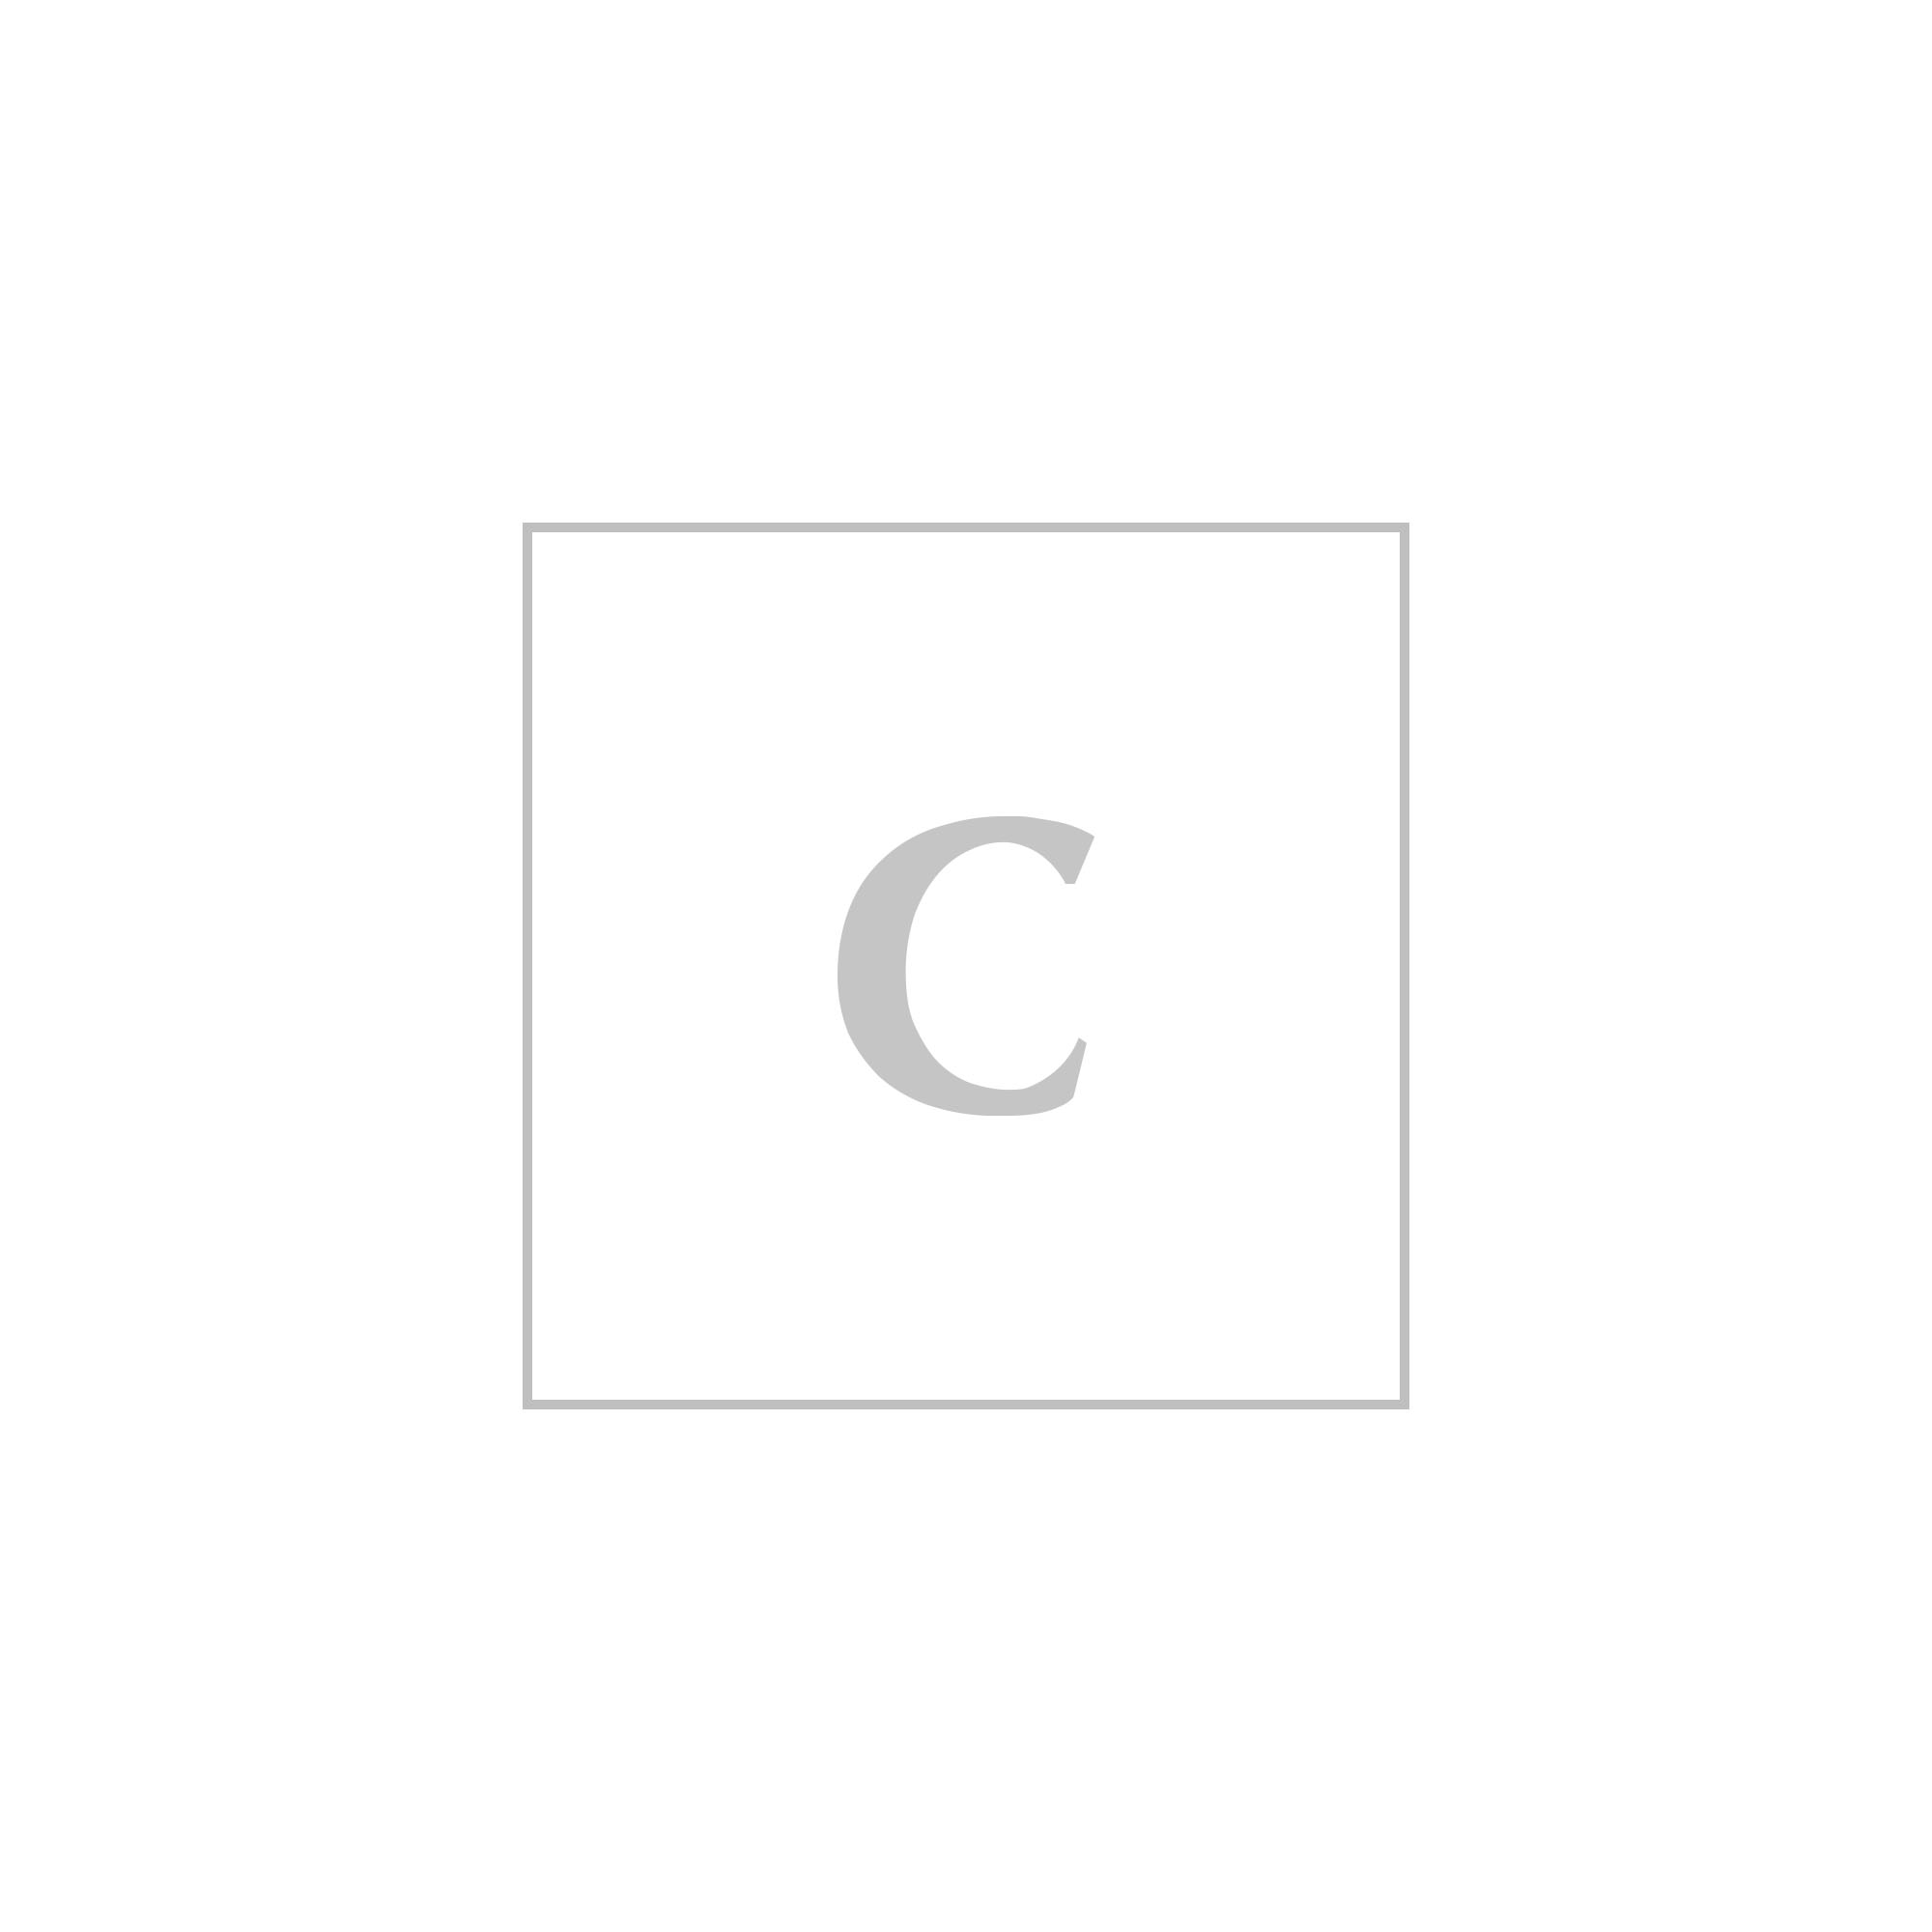 Moncler gamme rouge/bleu giaccone cathy